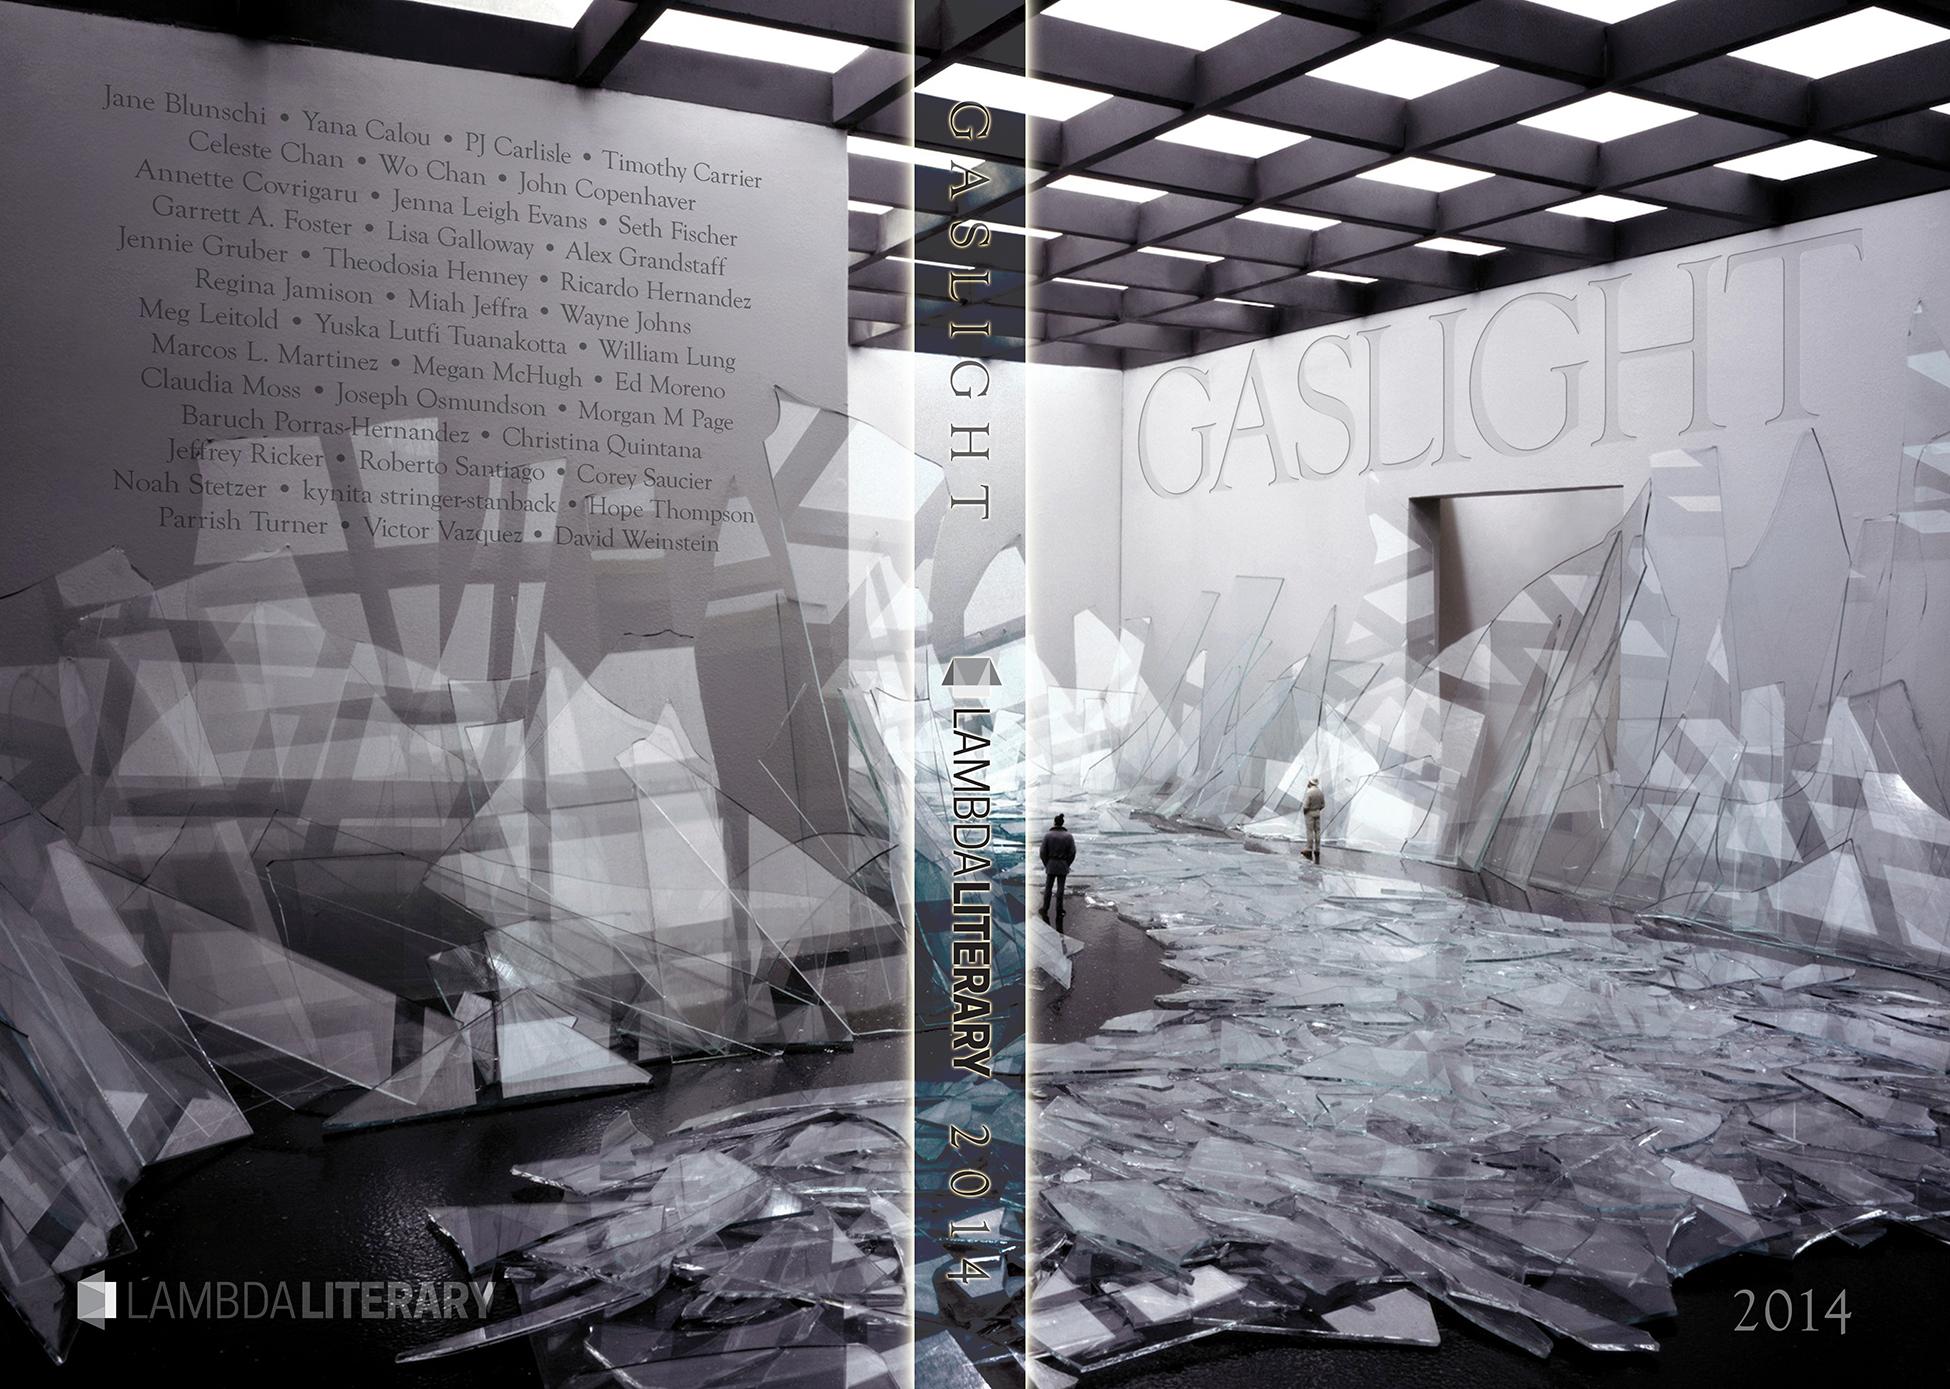 Gaslight, an E-Book Anthology of Writing by Lambda Fellows